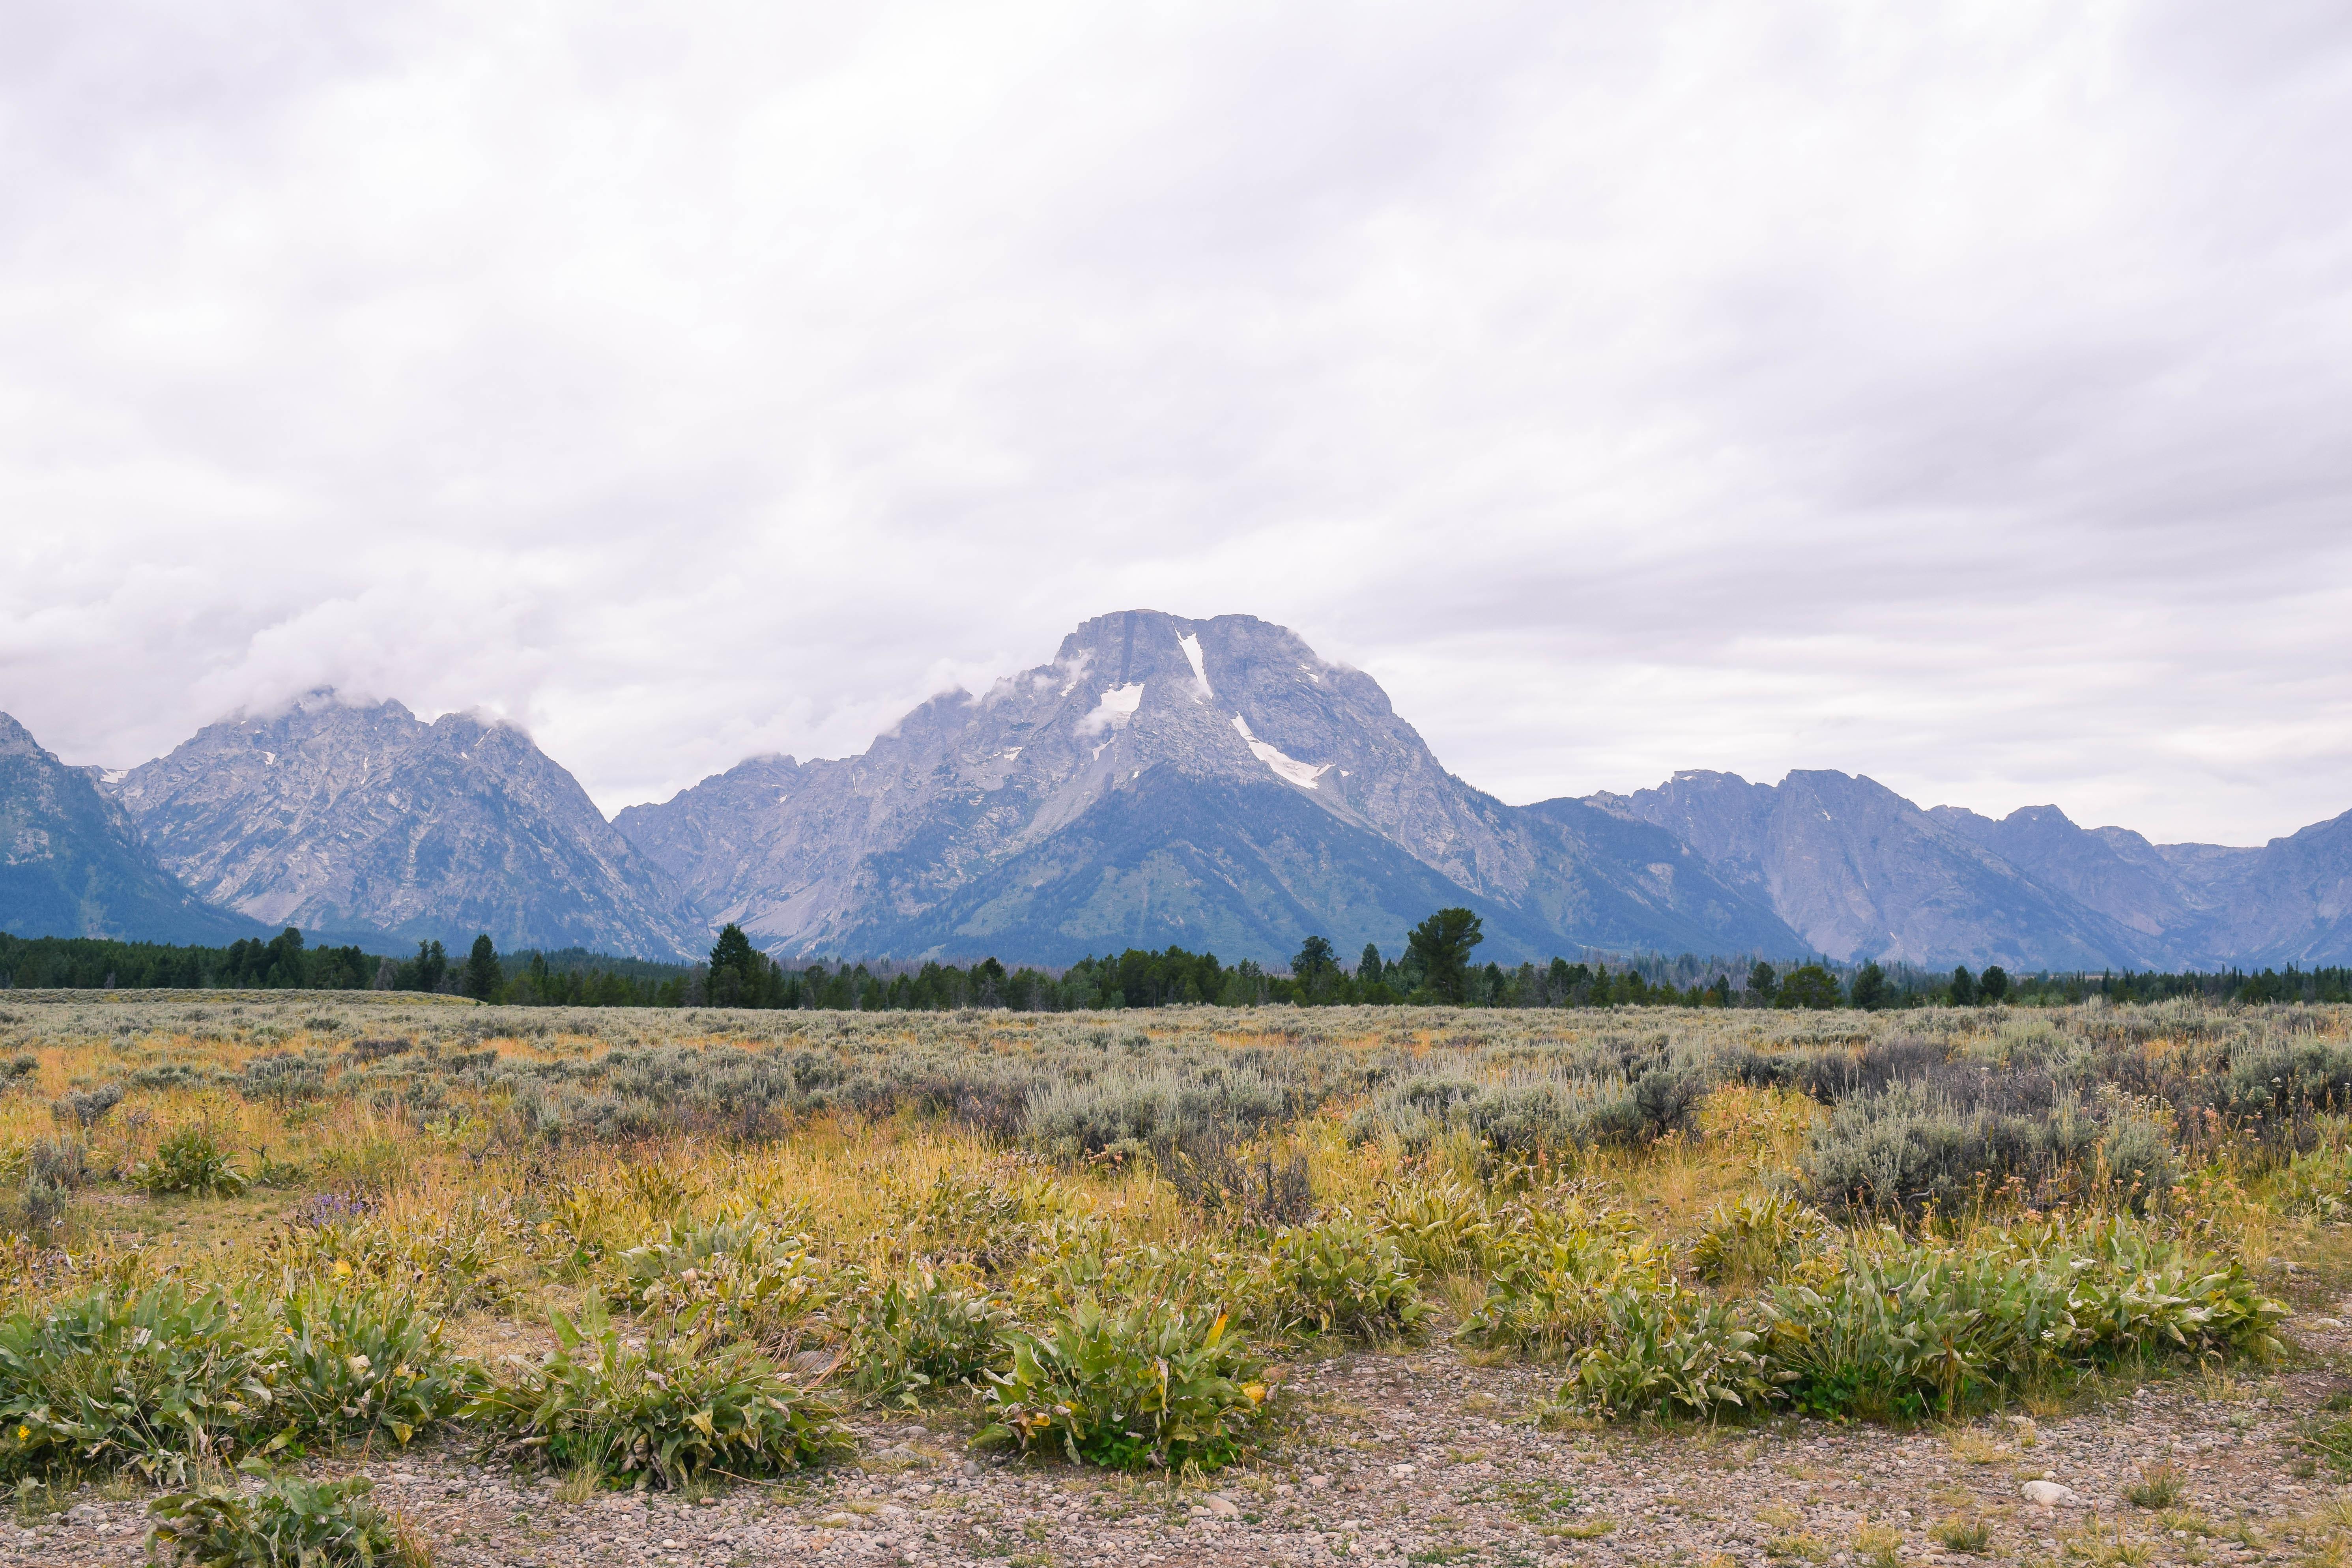 Photo Diary: Grand Teton National Park